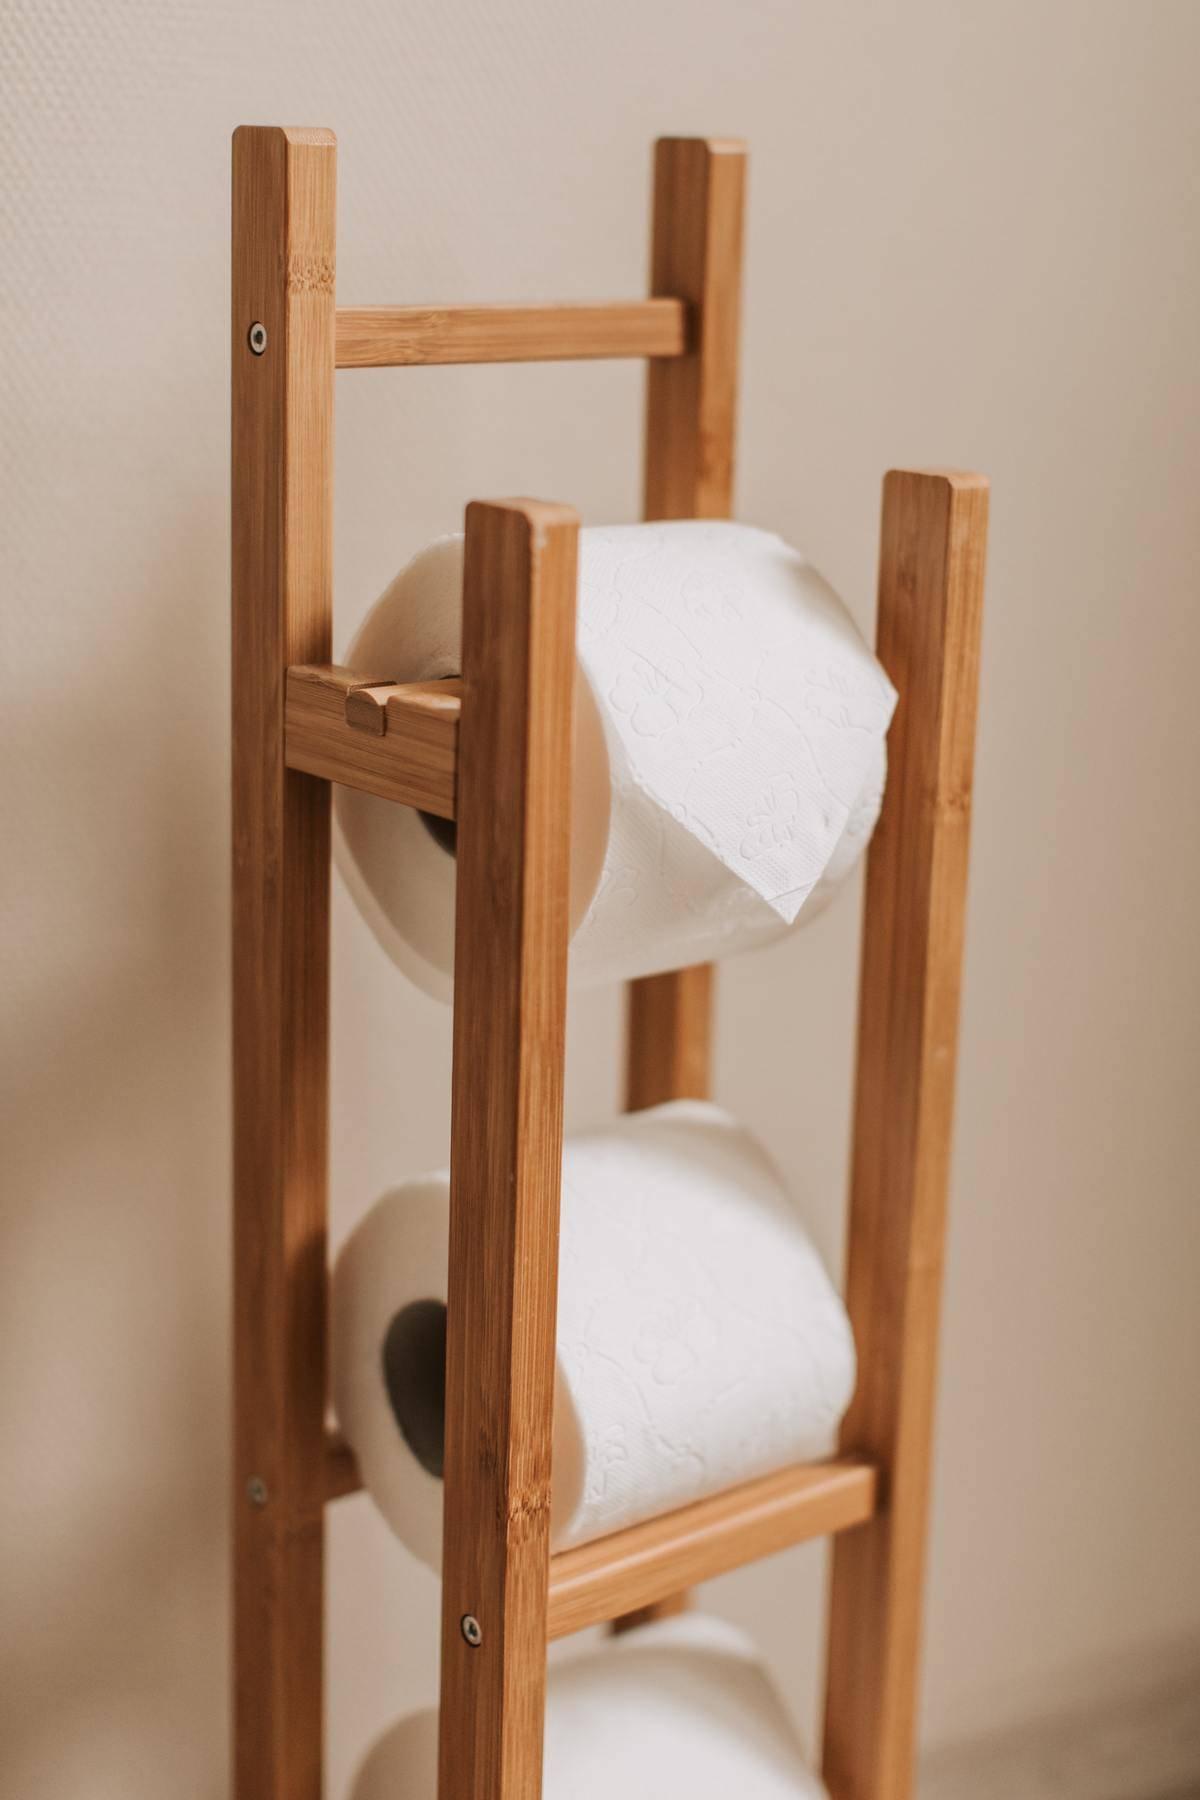 Three toilet Paper Rolls On Wooden Holder Rack